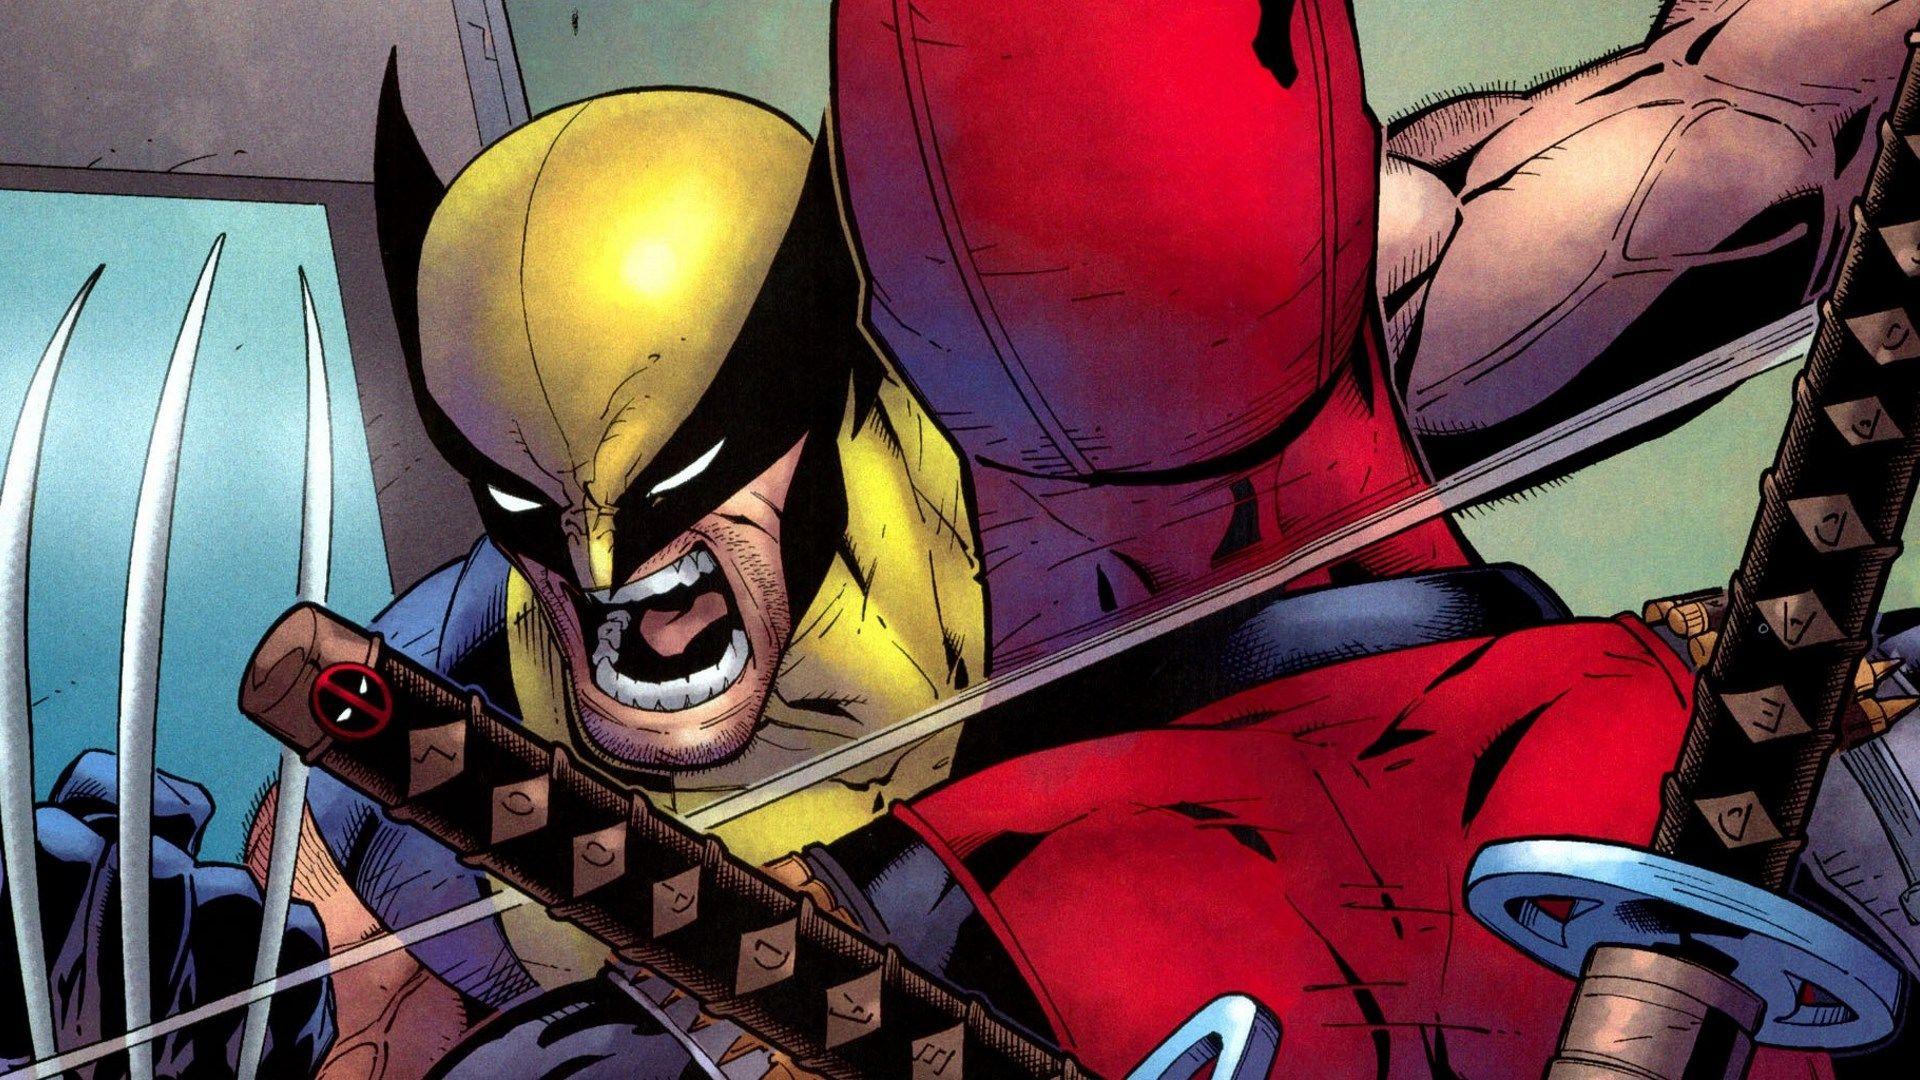 Desktop Wallpaper For X Men Origins Wolverine Vs Deadpool Deadpool Deadpool Hd Wallpaper Wolverine